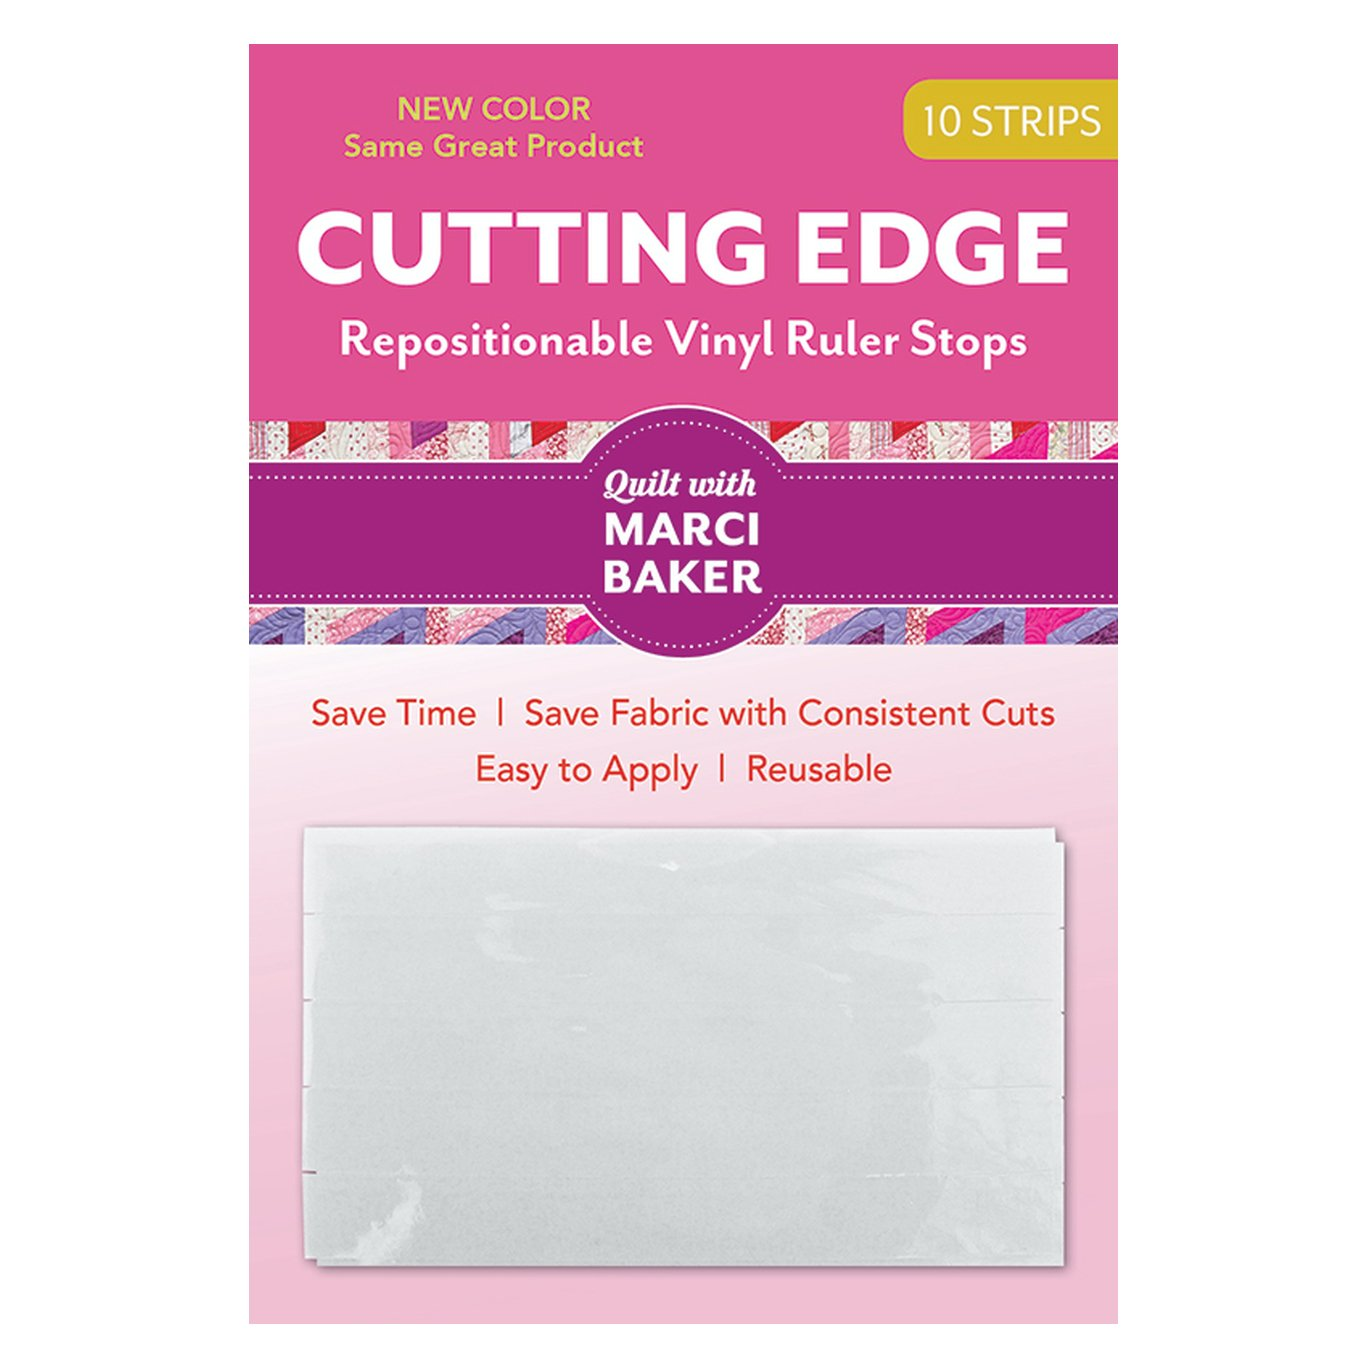 QTools Cutting Edge Ruler Stops - 10 Pack